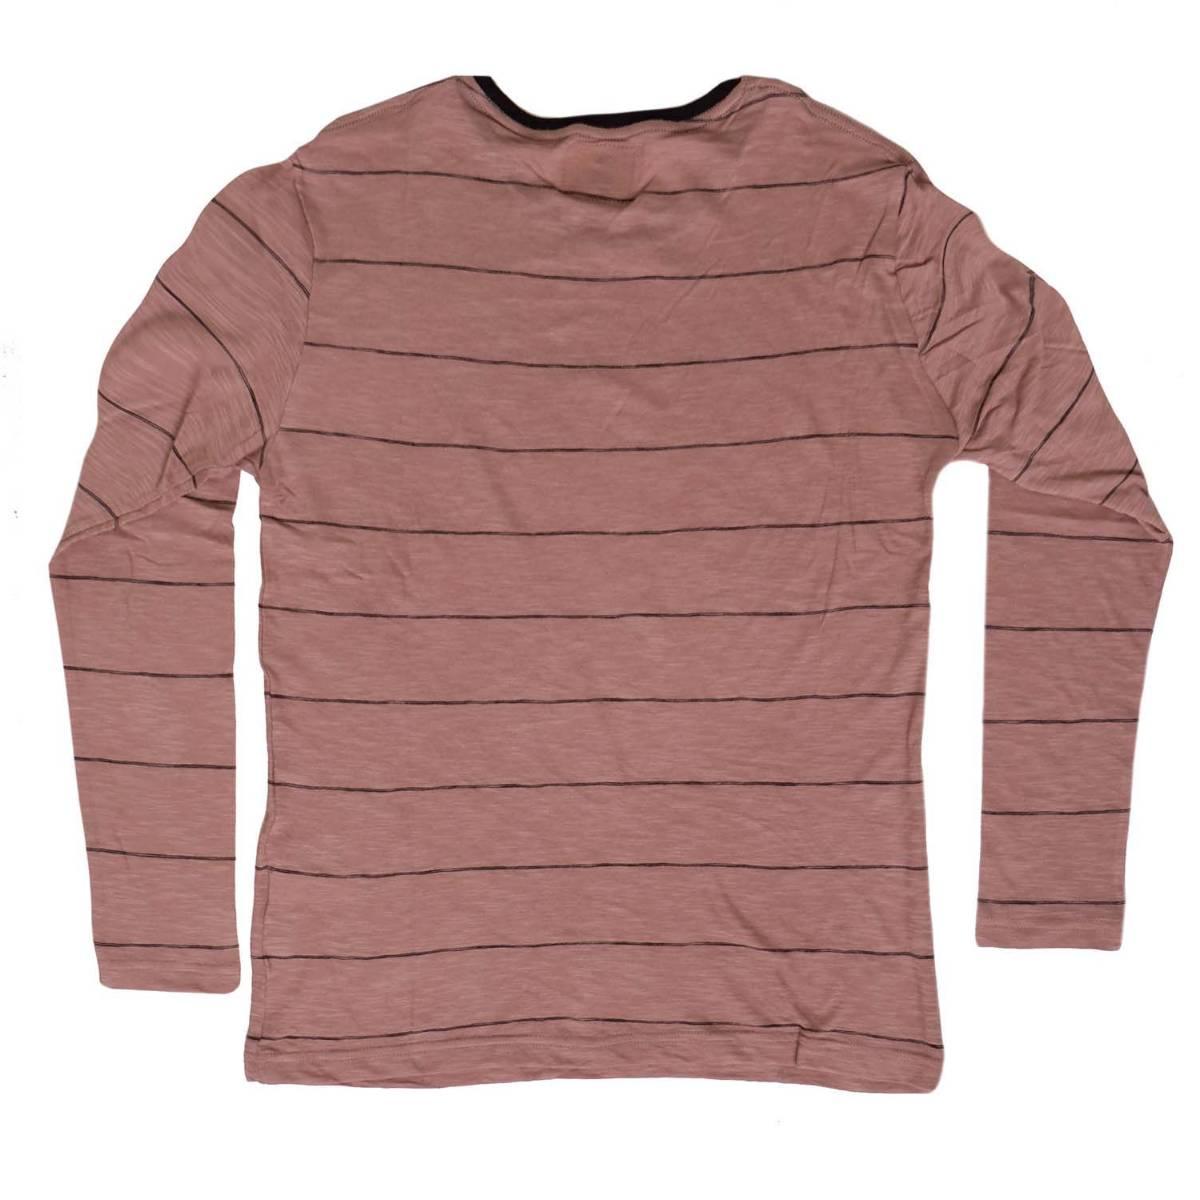 Kaos Lengan Panjang Chester Brown Thin Stripe Ls Sentral Online Polos Orange Triton Ls2